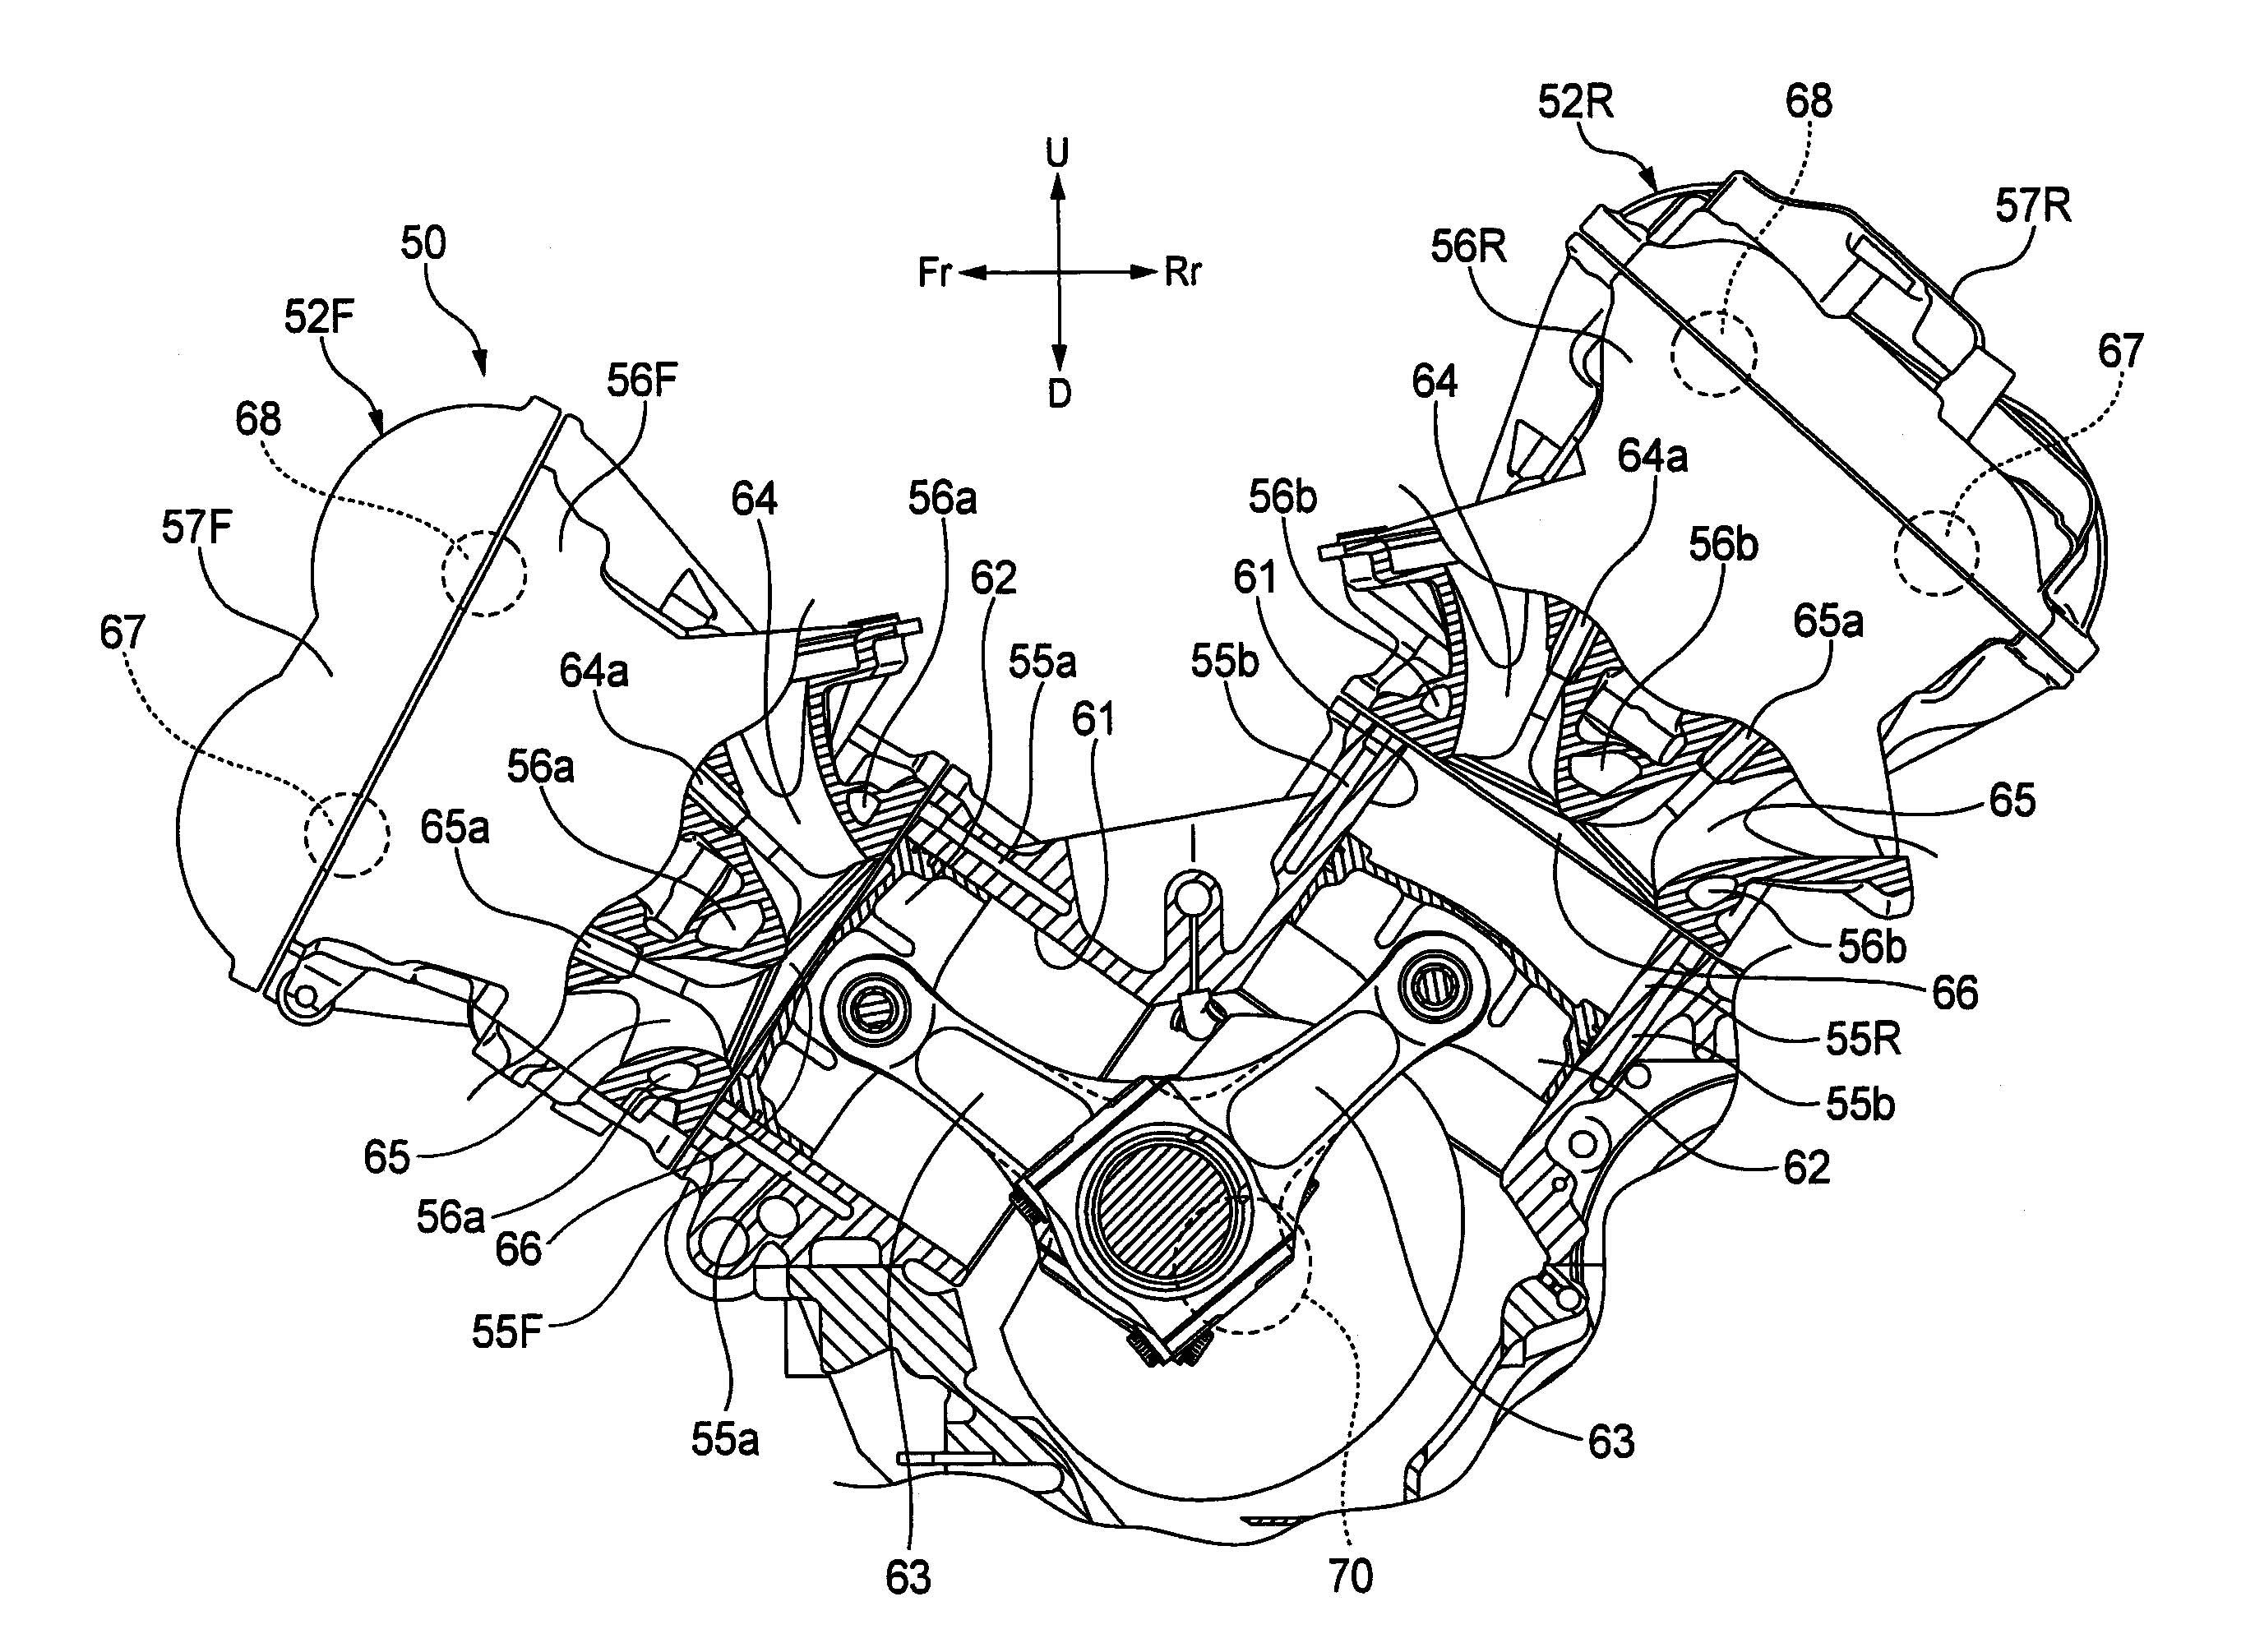 Motorcycle Engine Drawing At Getdrawings